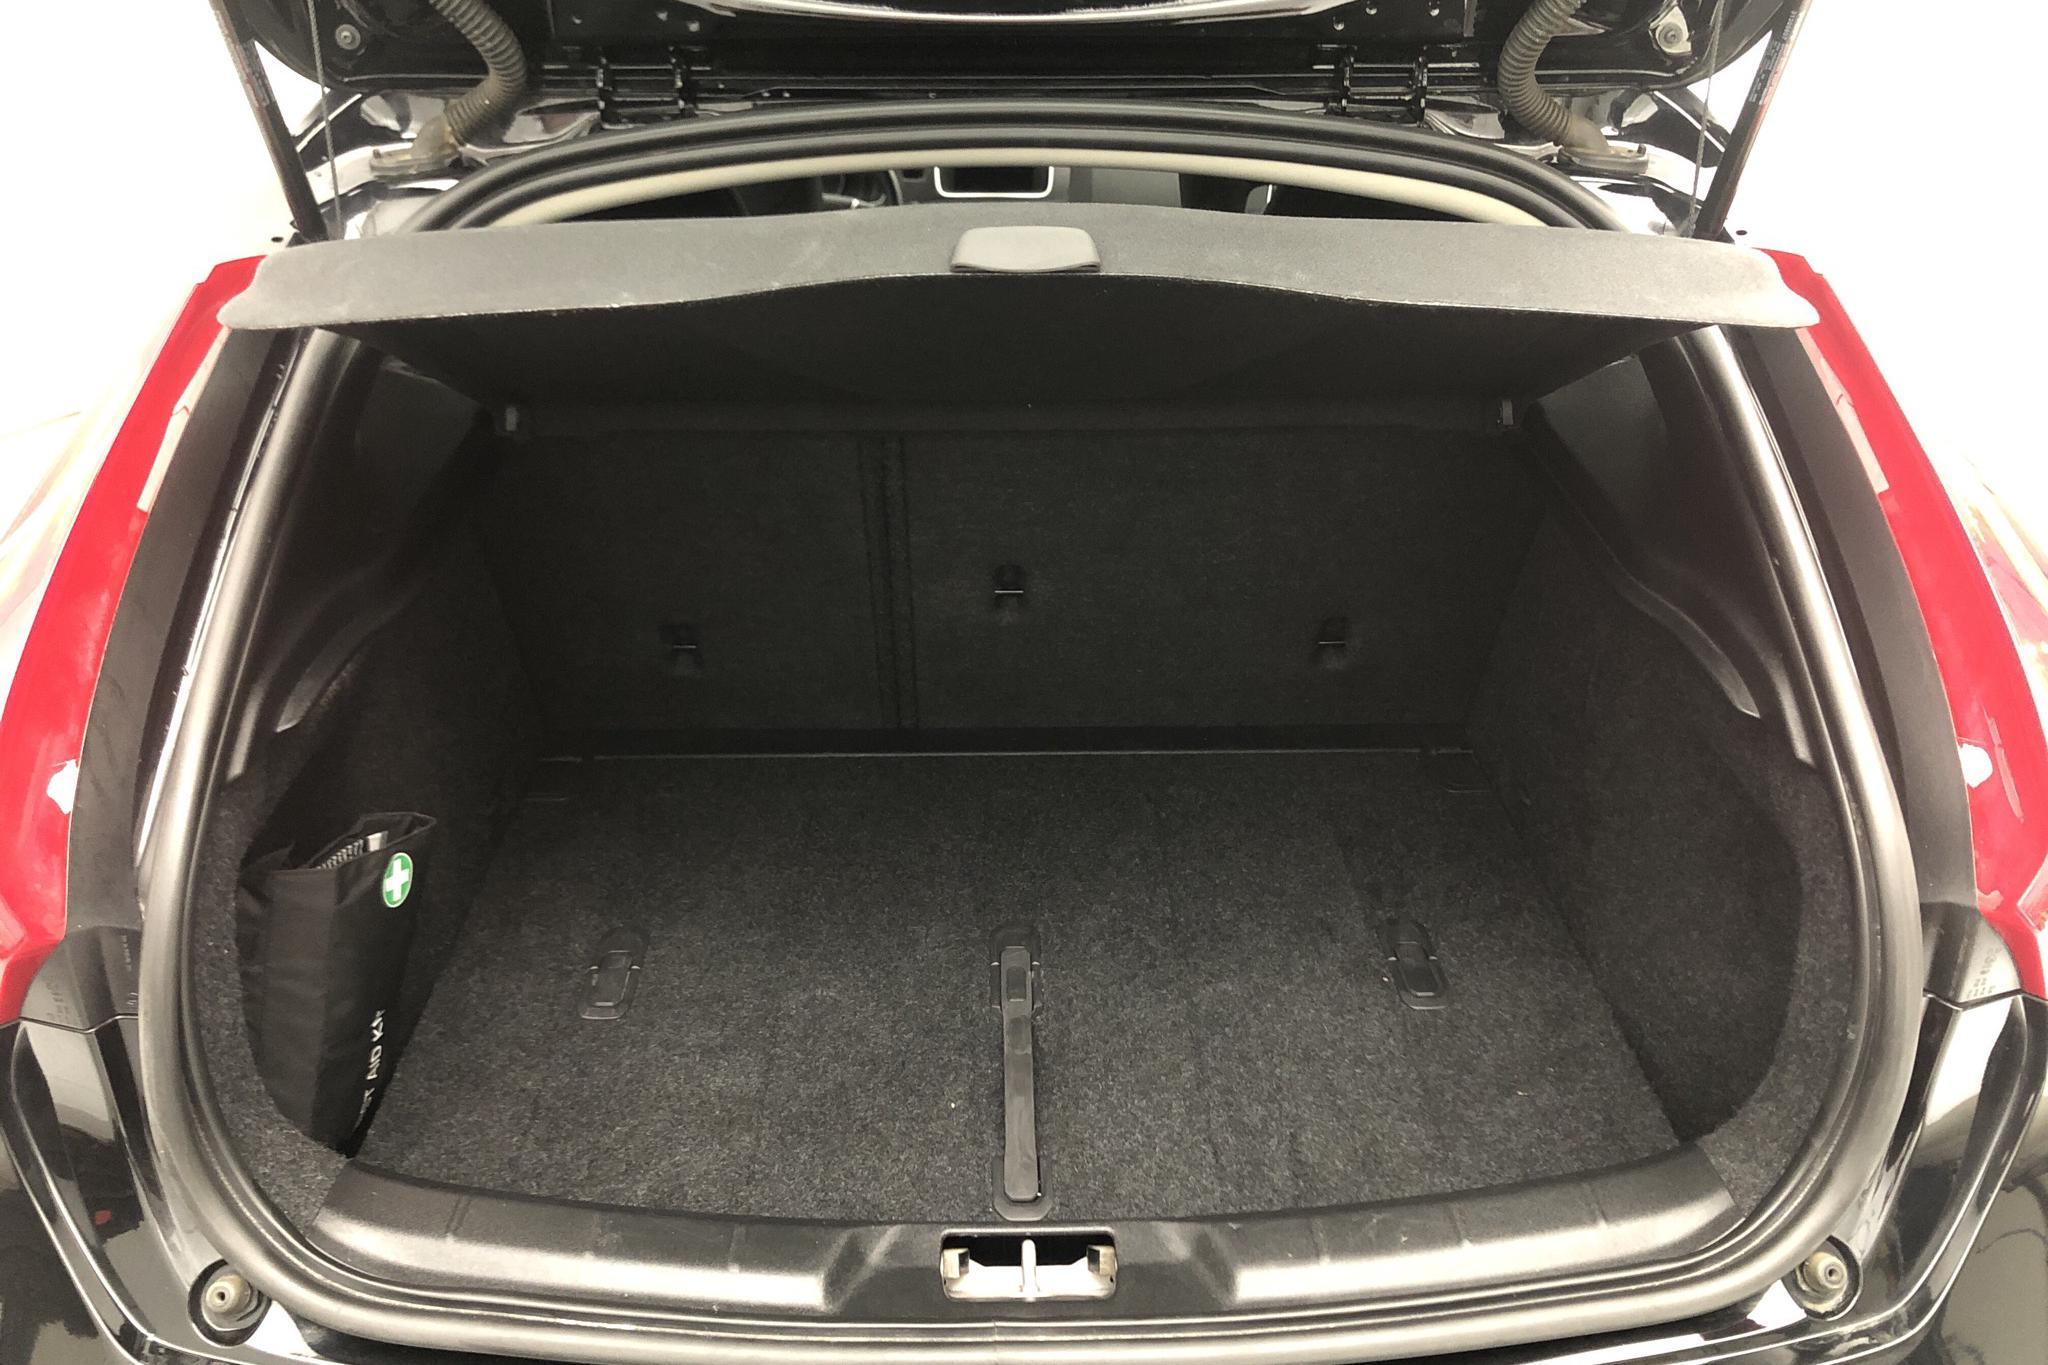 Volvo V40 Cross Country D3 (150hk) - 68 910 km - Automatic - black - 2019